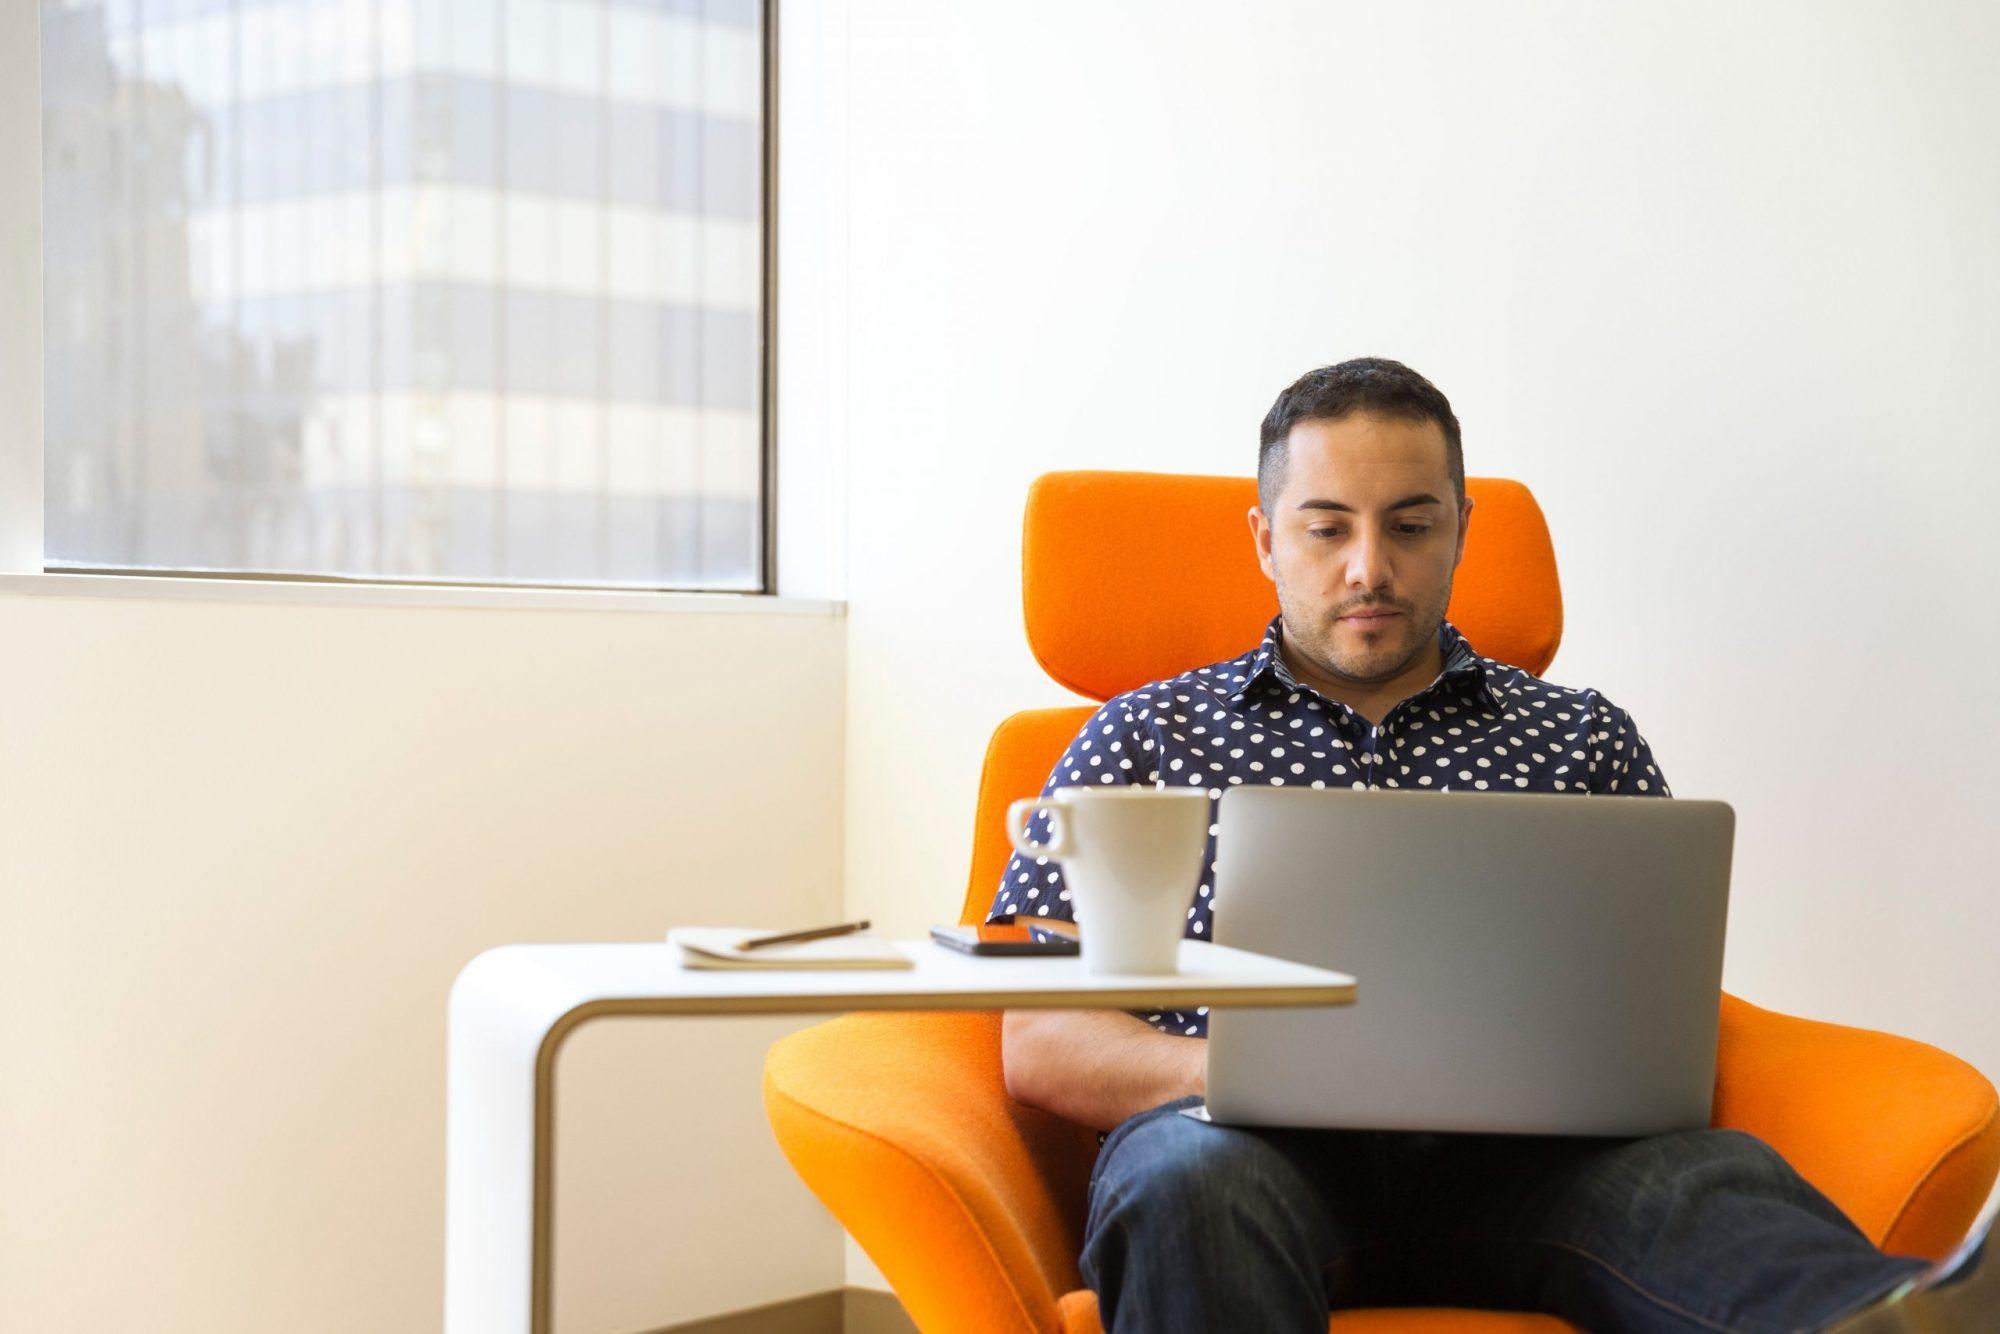 Photo by LinkedIn Sales Navigator from Pexels